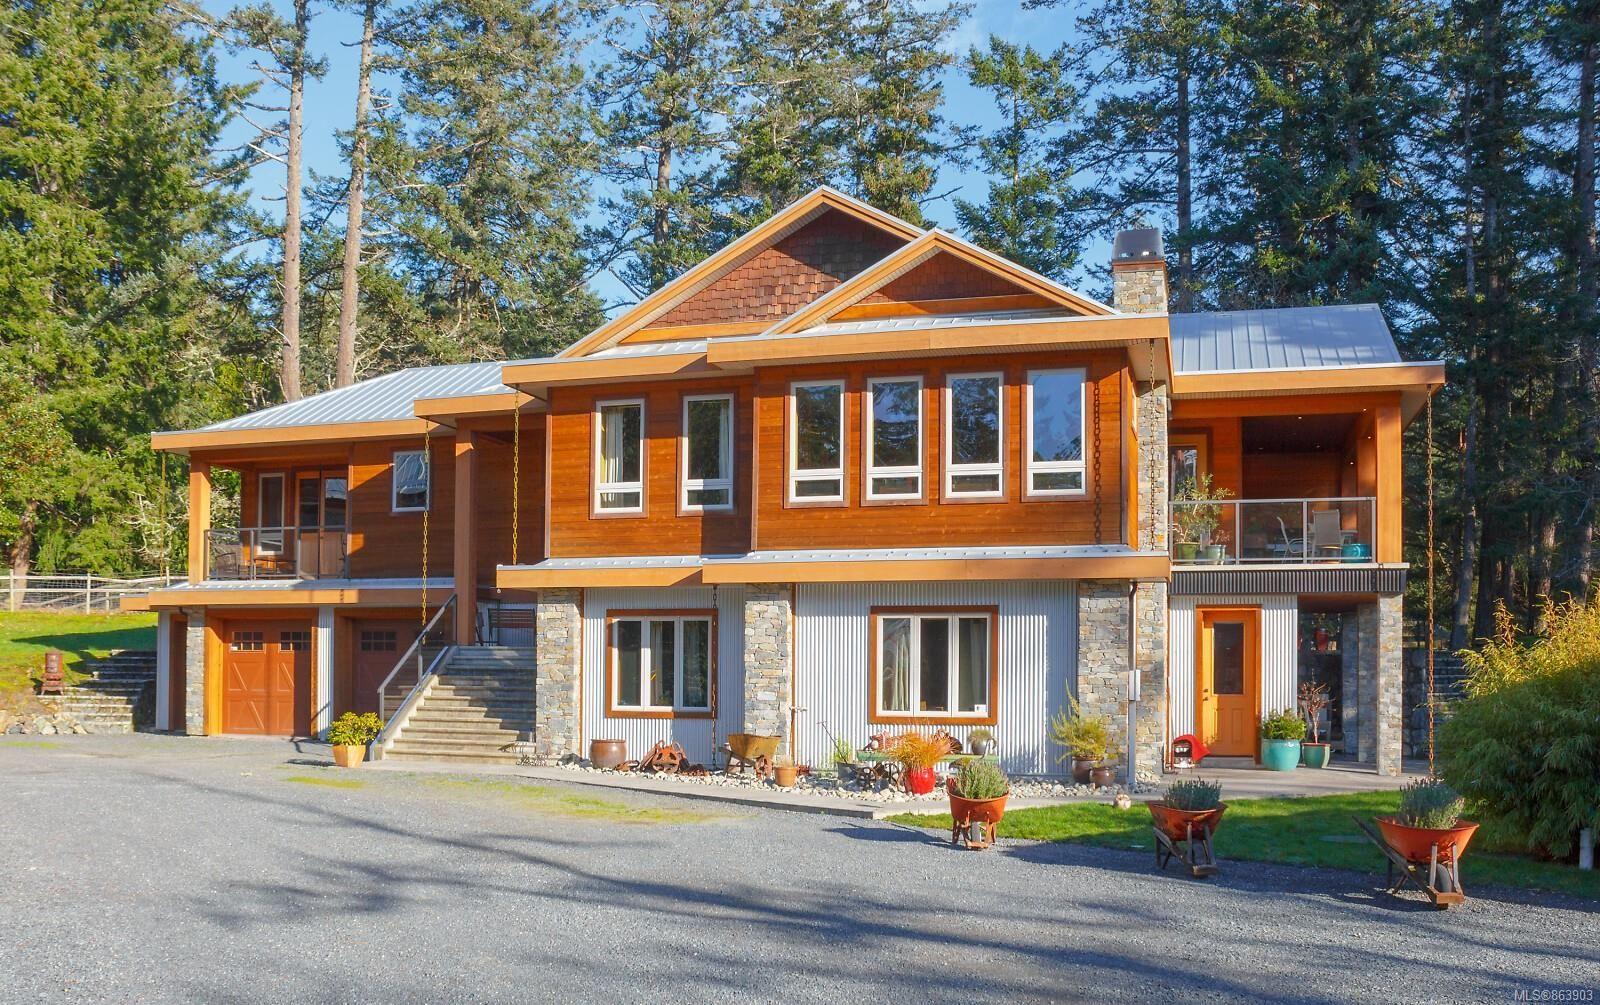 Main Photo: 823 Pears Rd in : Me Metchosin House for sale (Metchosin)  : MLS®# 863903